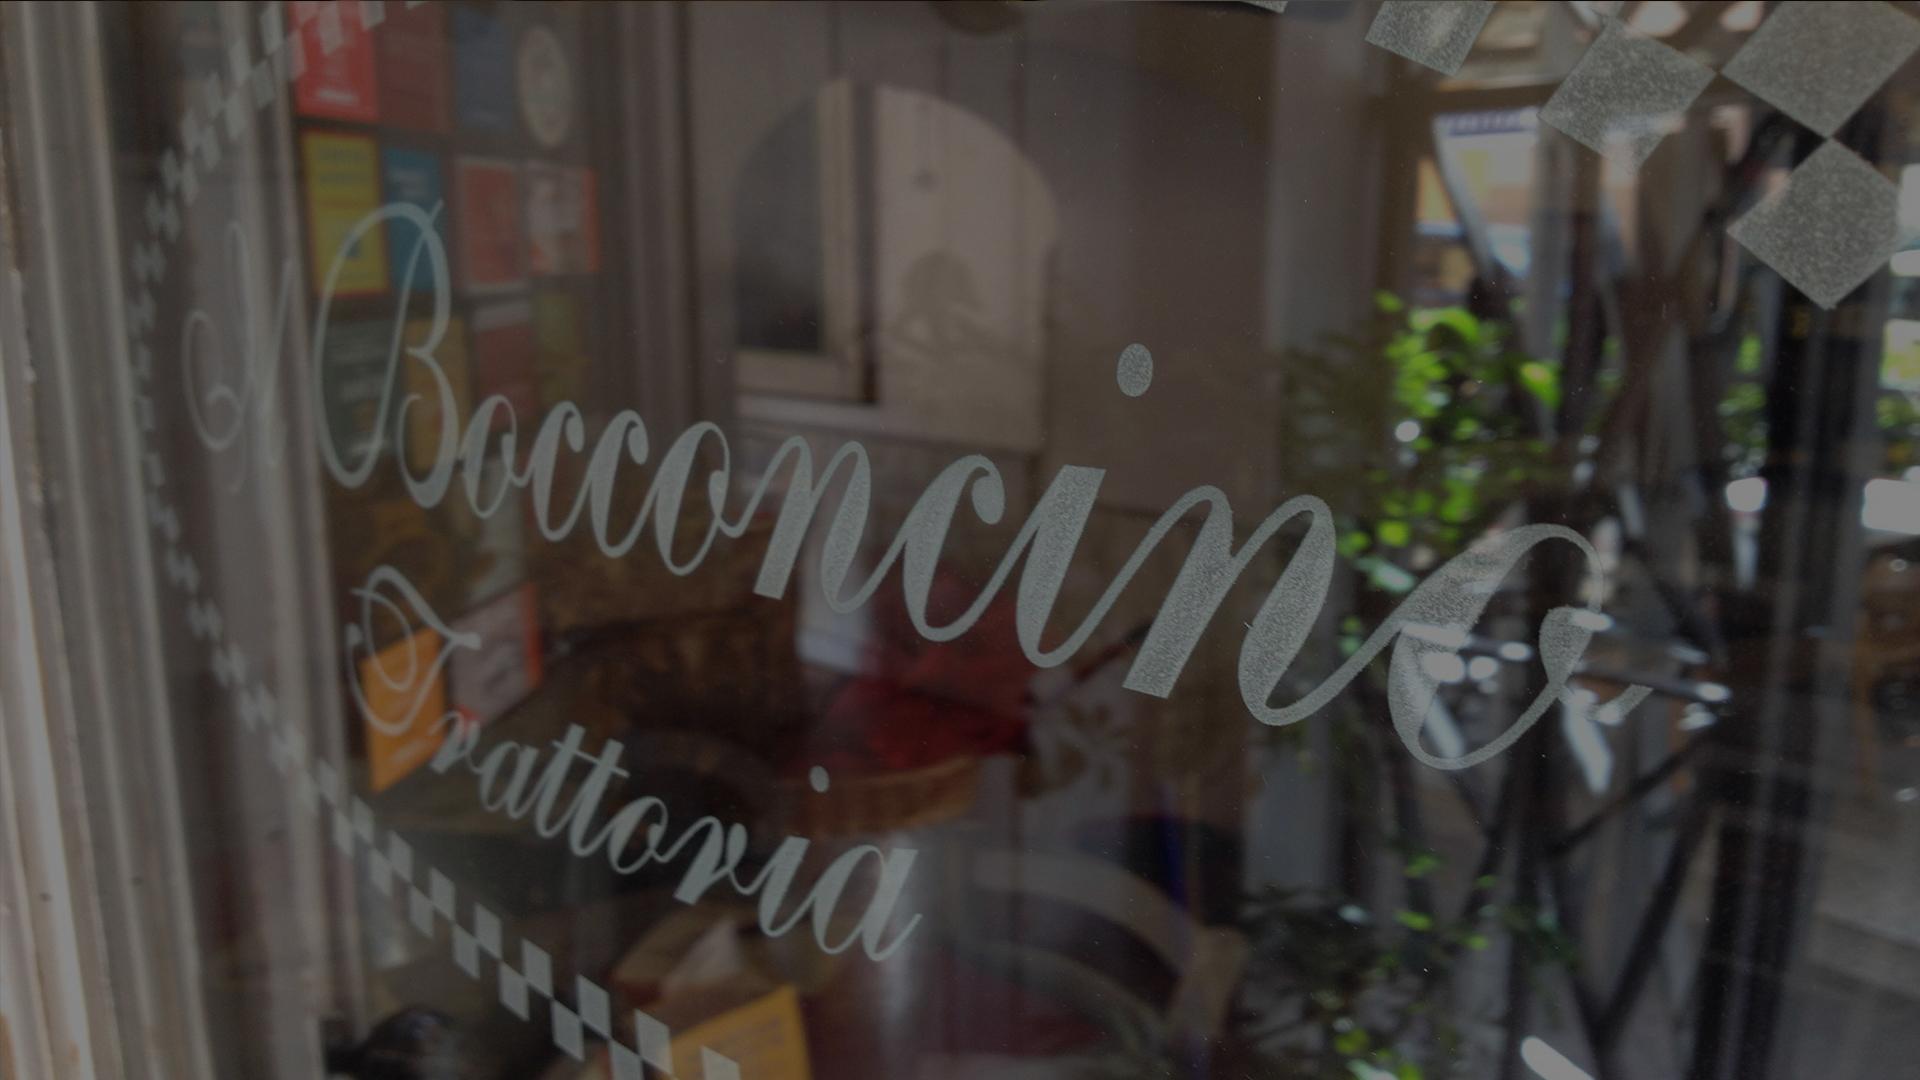 Ingresso Bocconcino Roma Via Ostilia 23